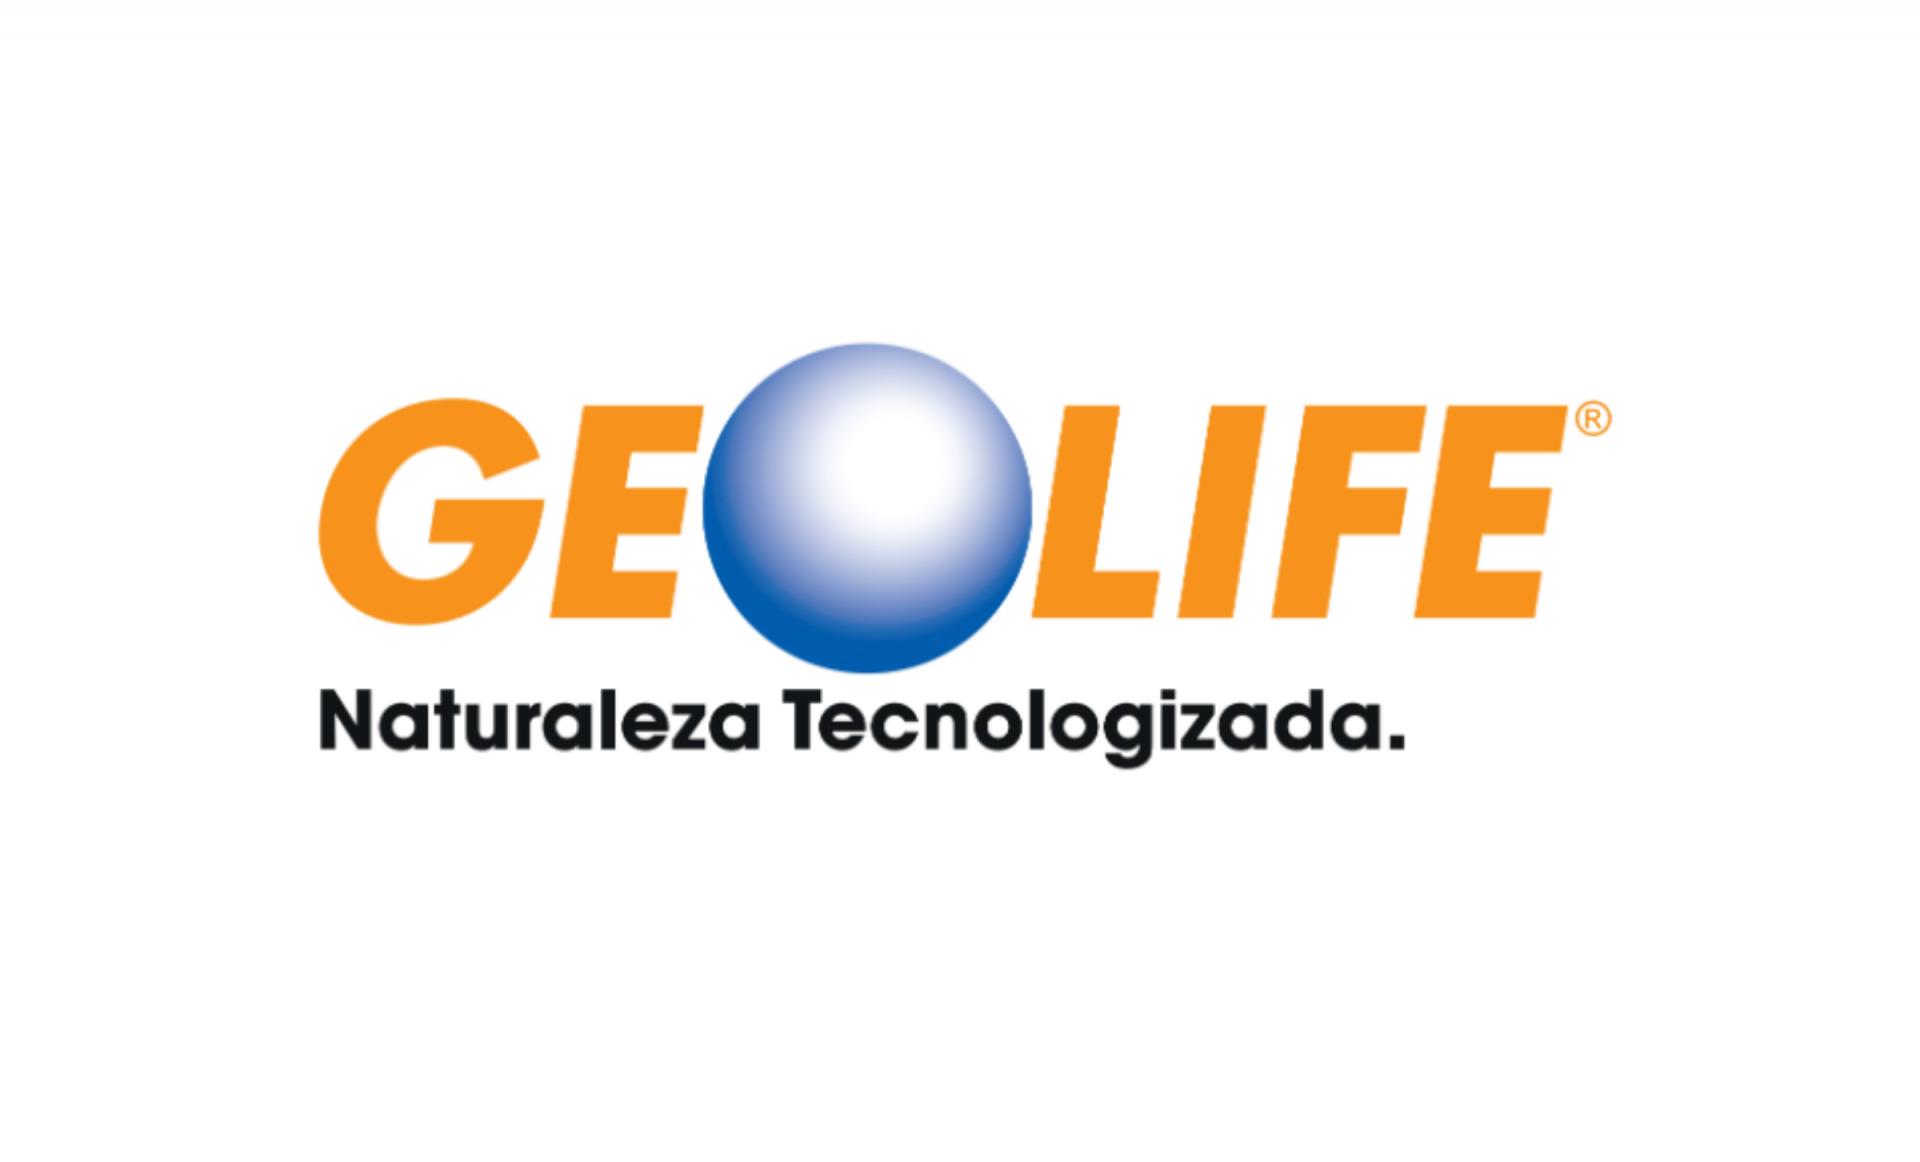 Geolife